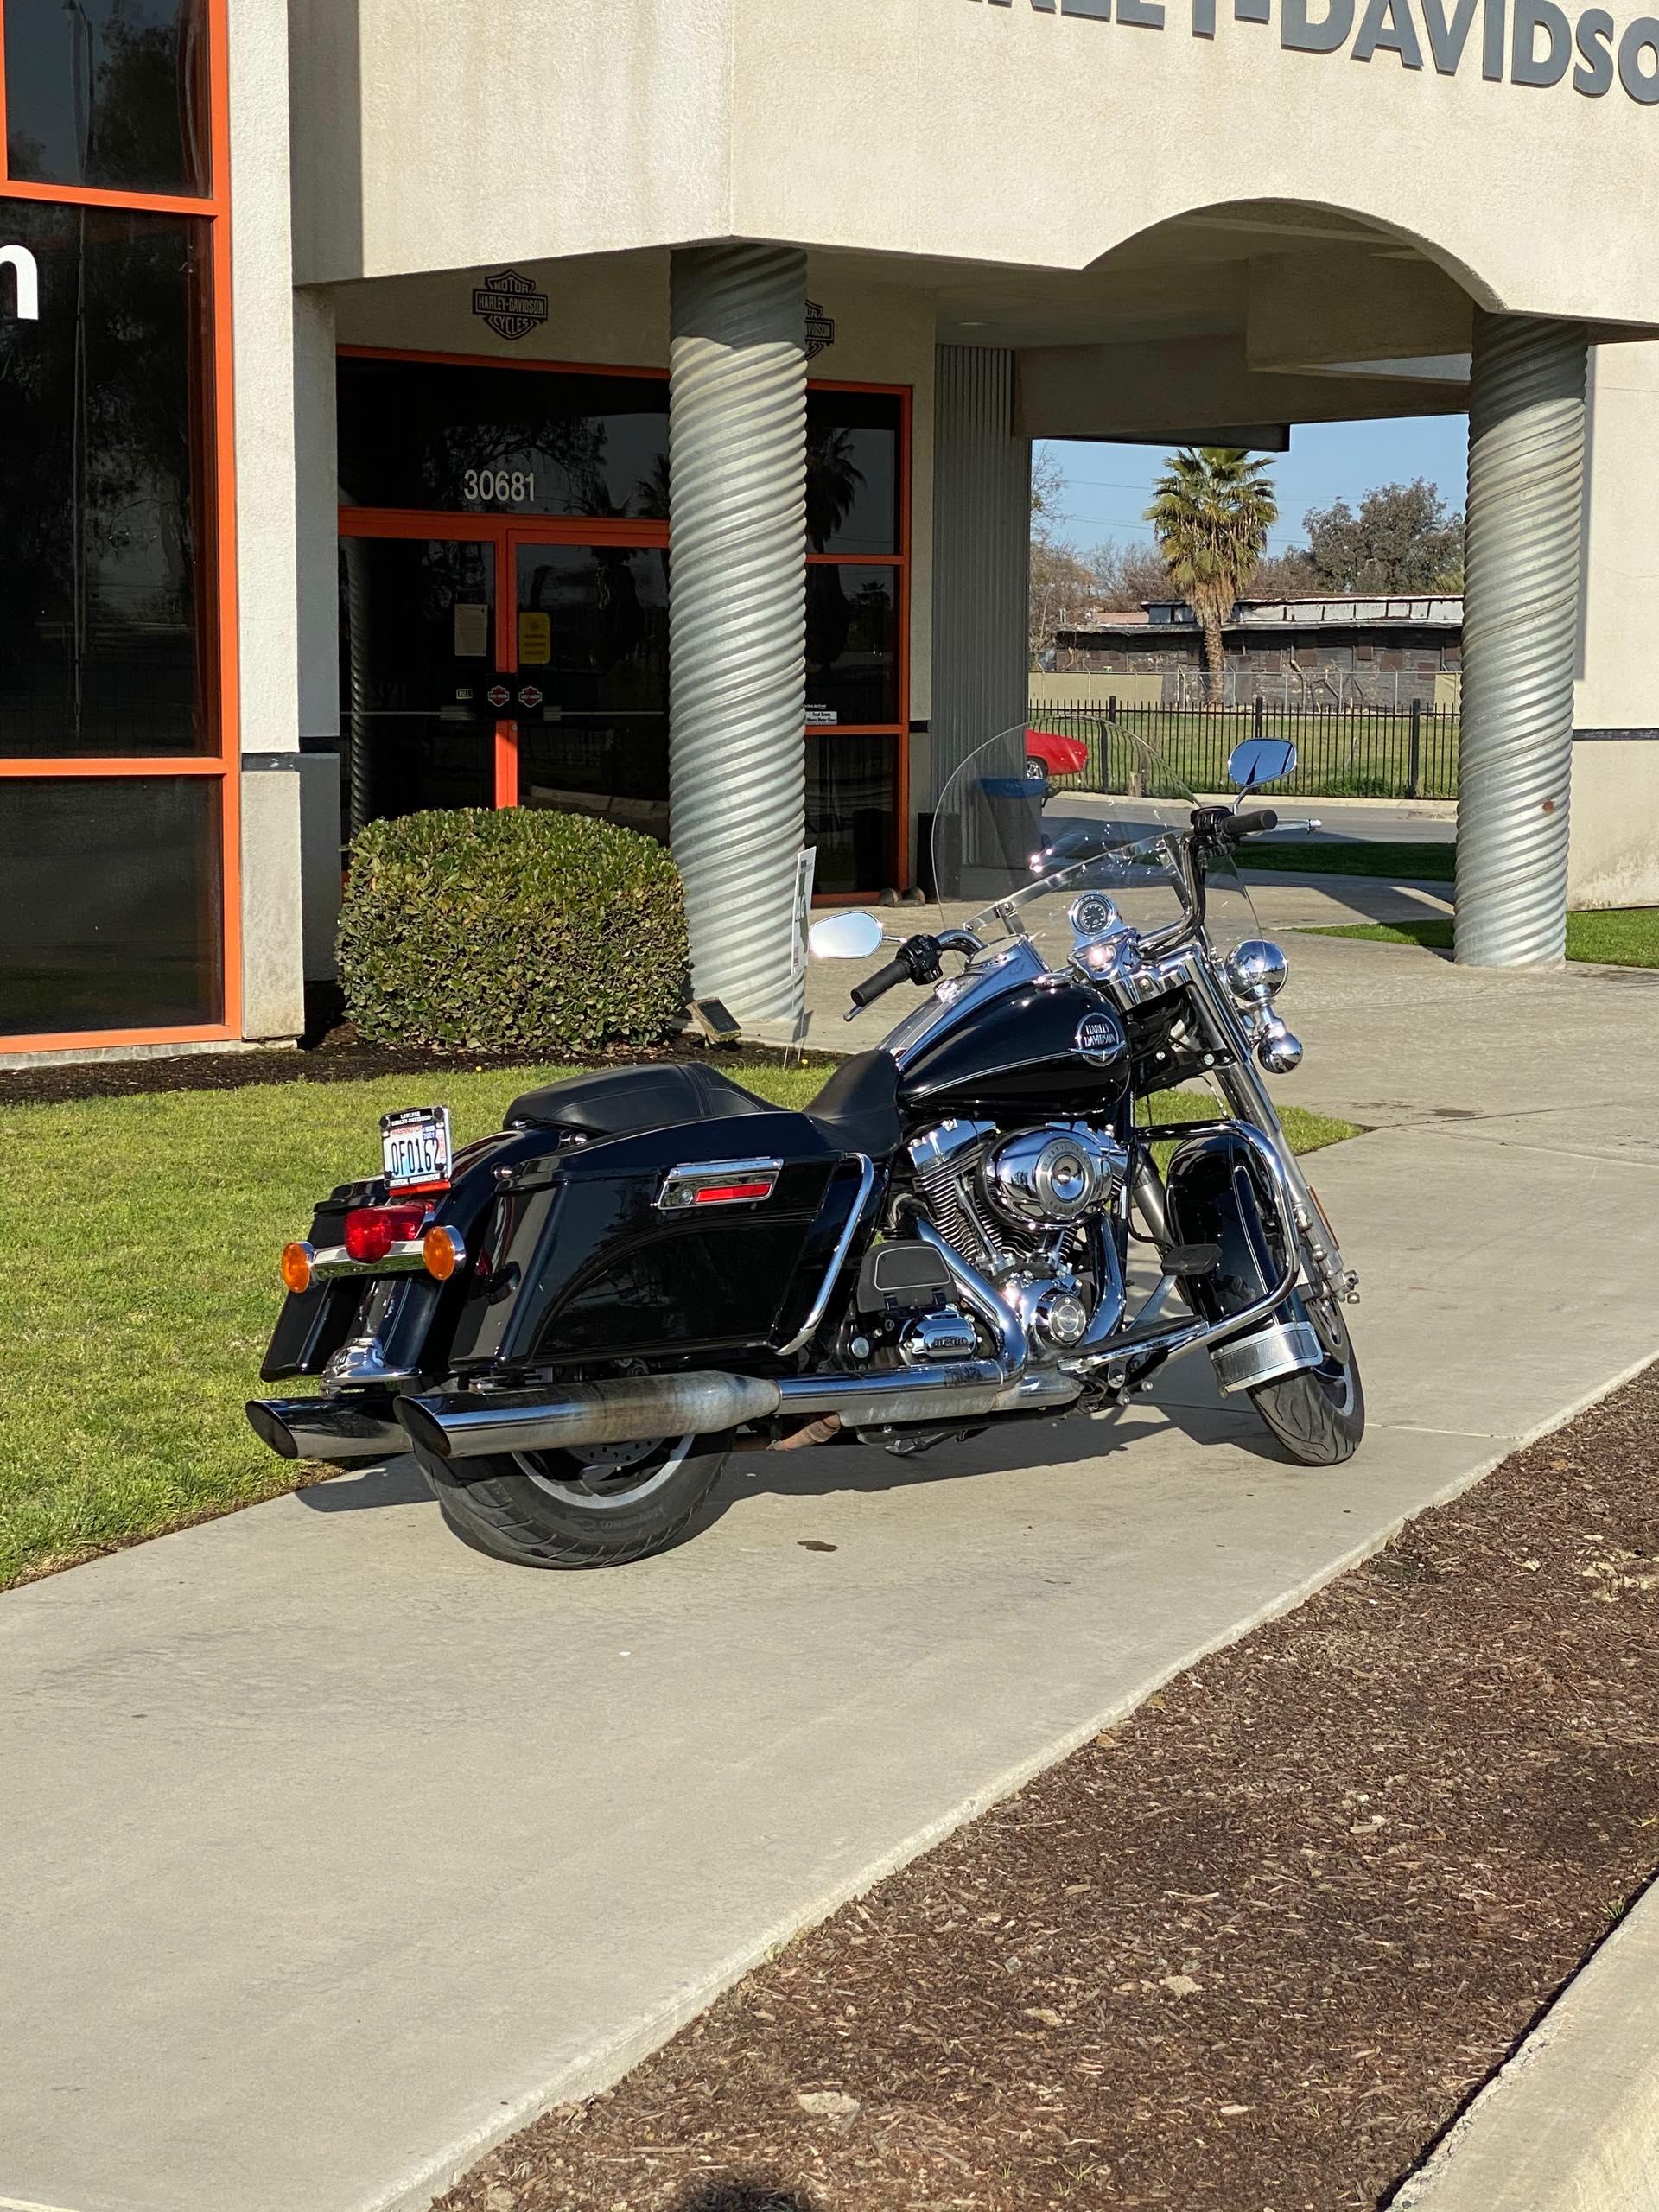 2010 Harley-Davidson Road King Classic at Visalia Harley-Davidson